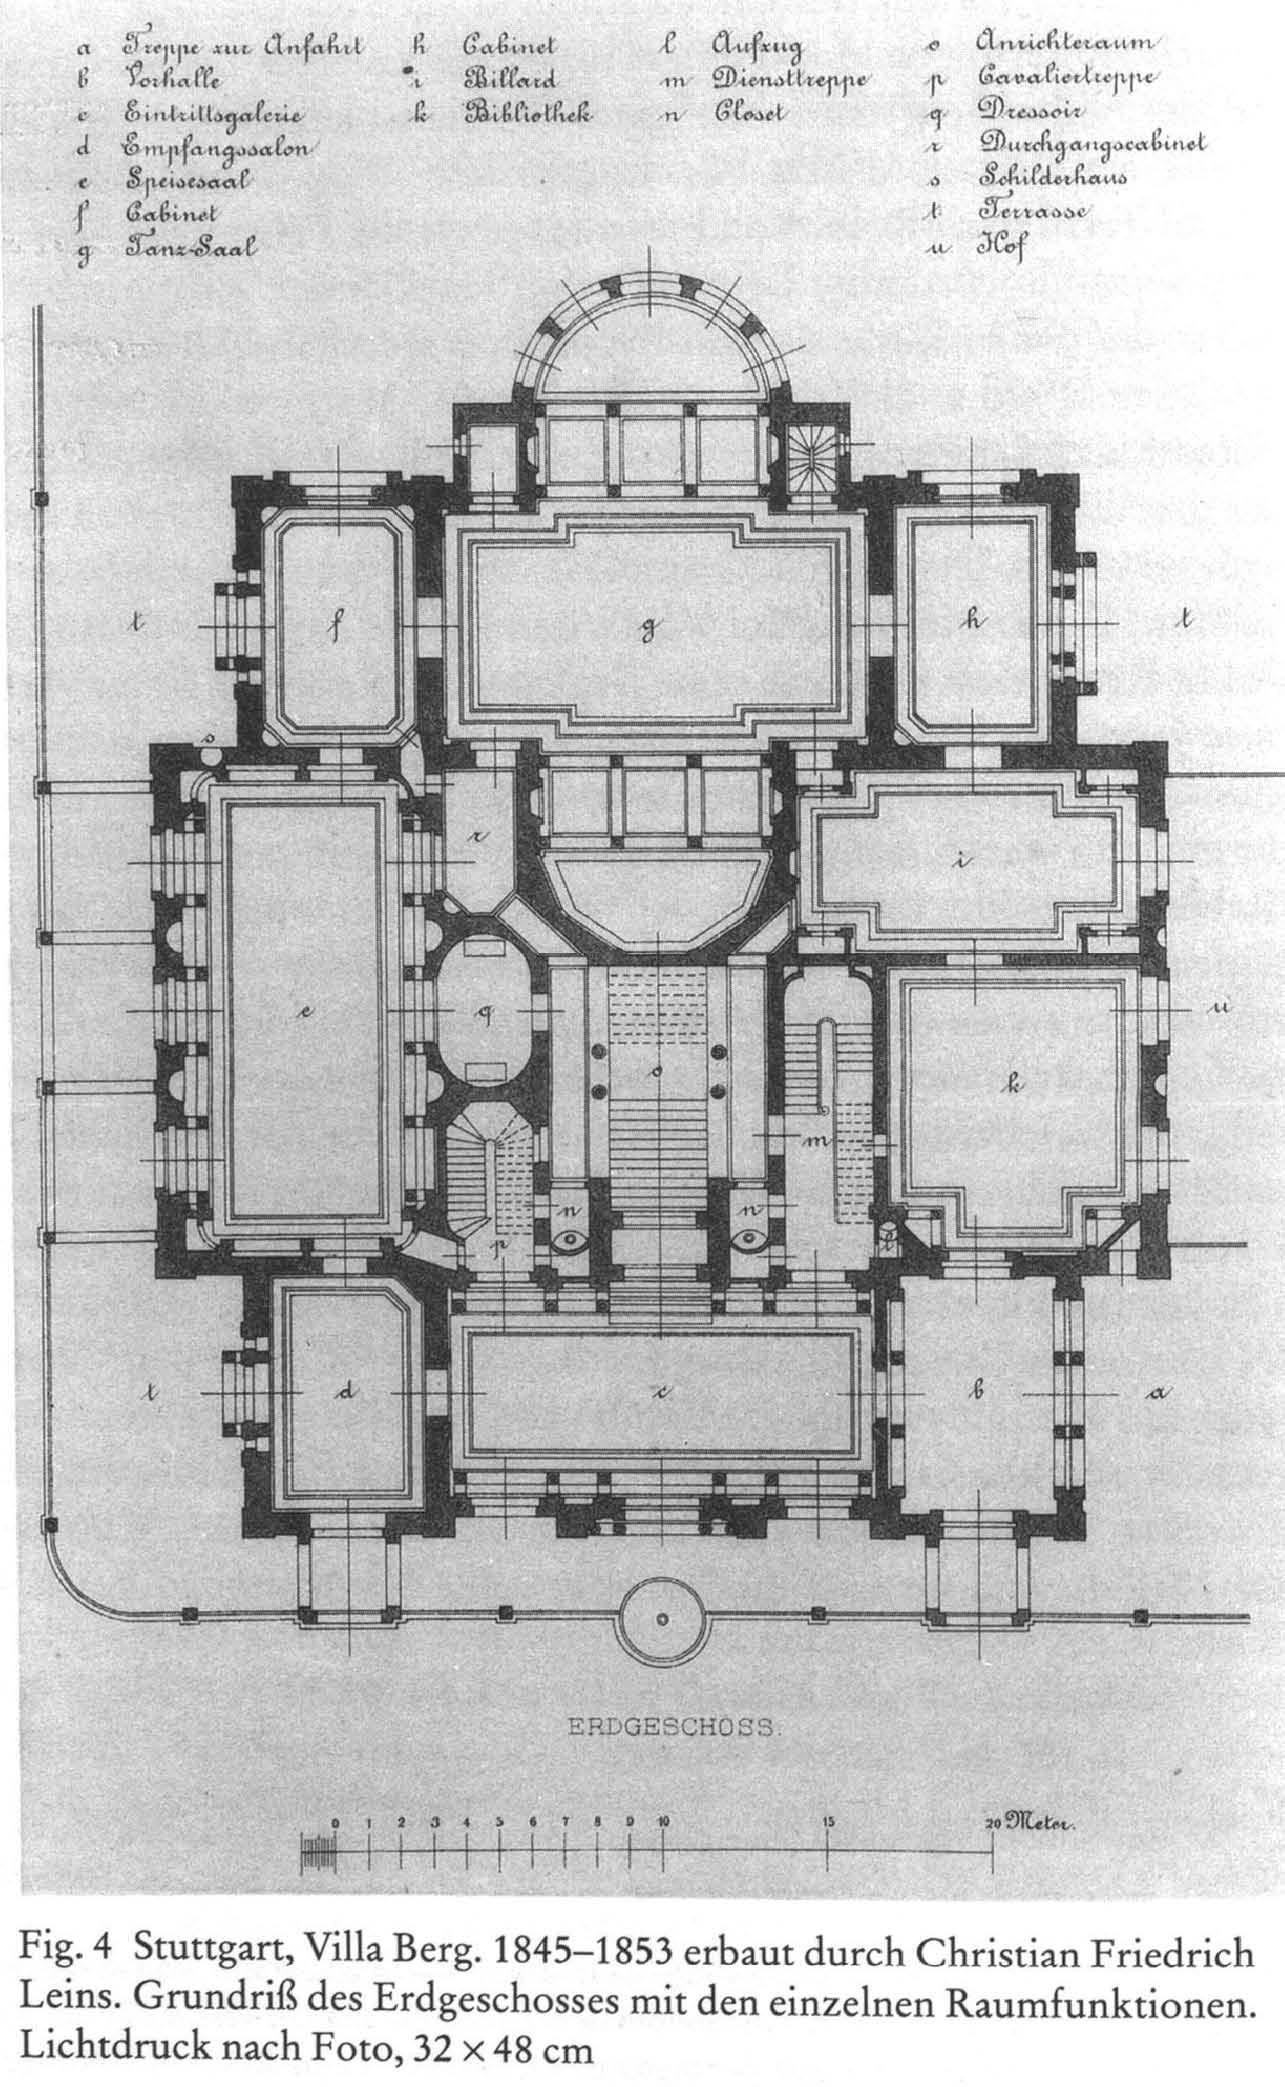 file christian friedrich von leins villa berg grundri des erdgeschosses wikimedia. Black Bedroom Furniture Sets. Home Design Ideas